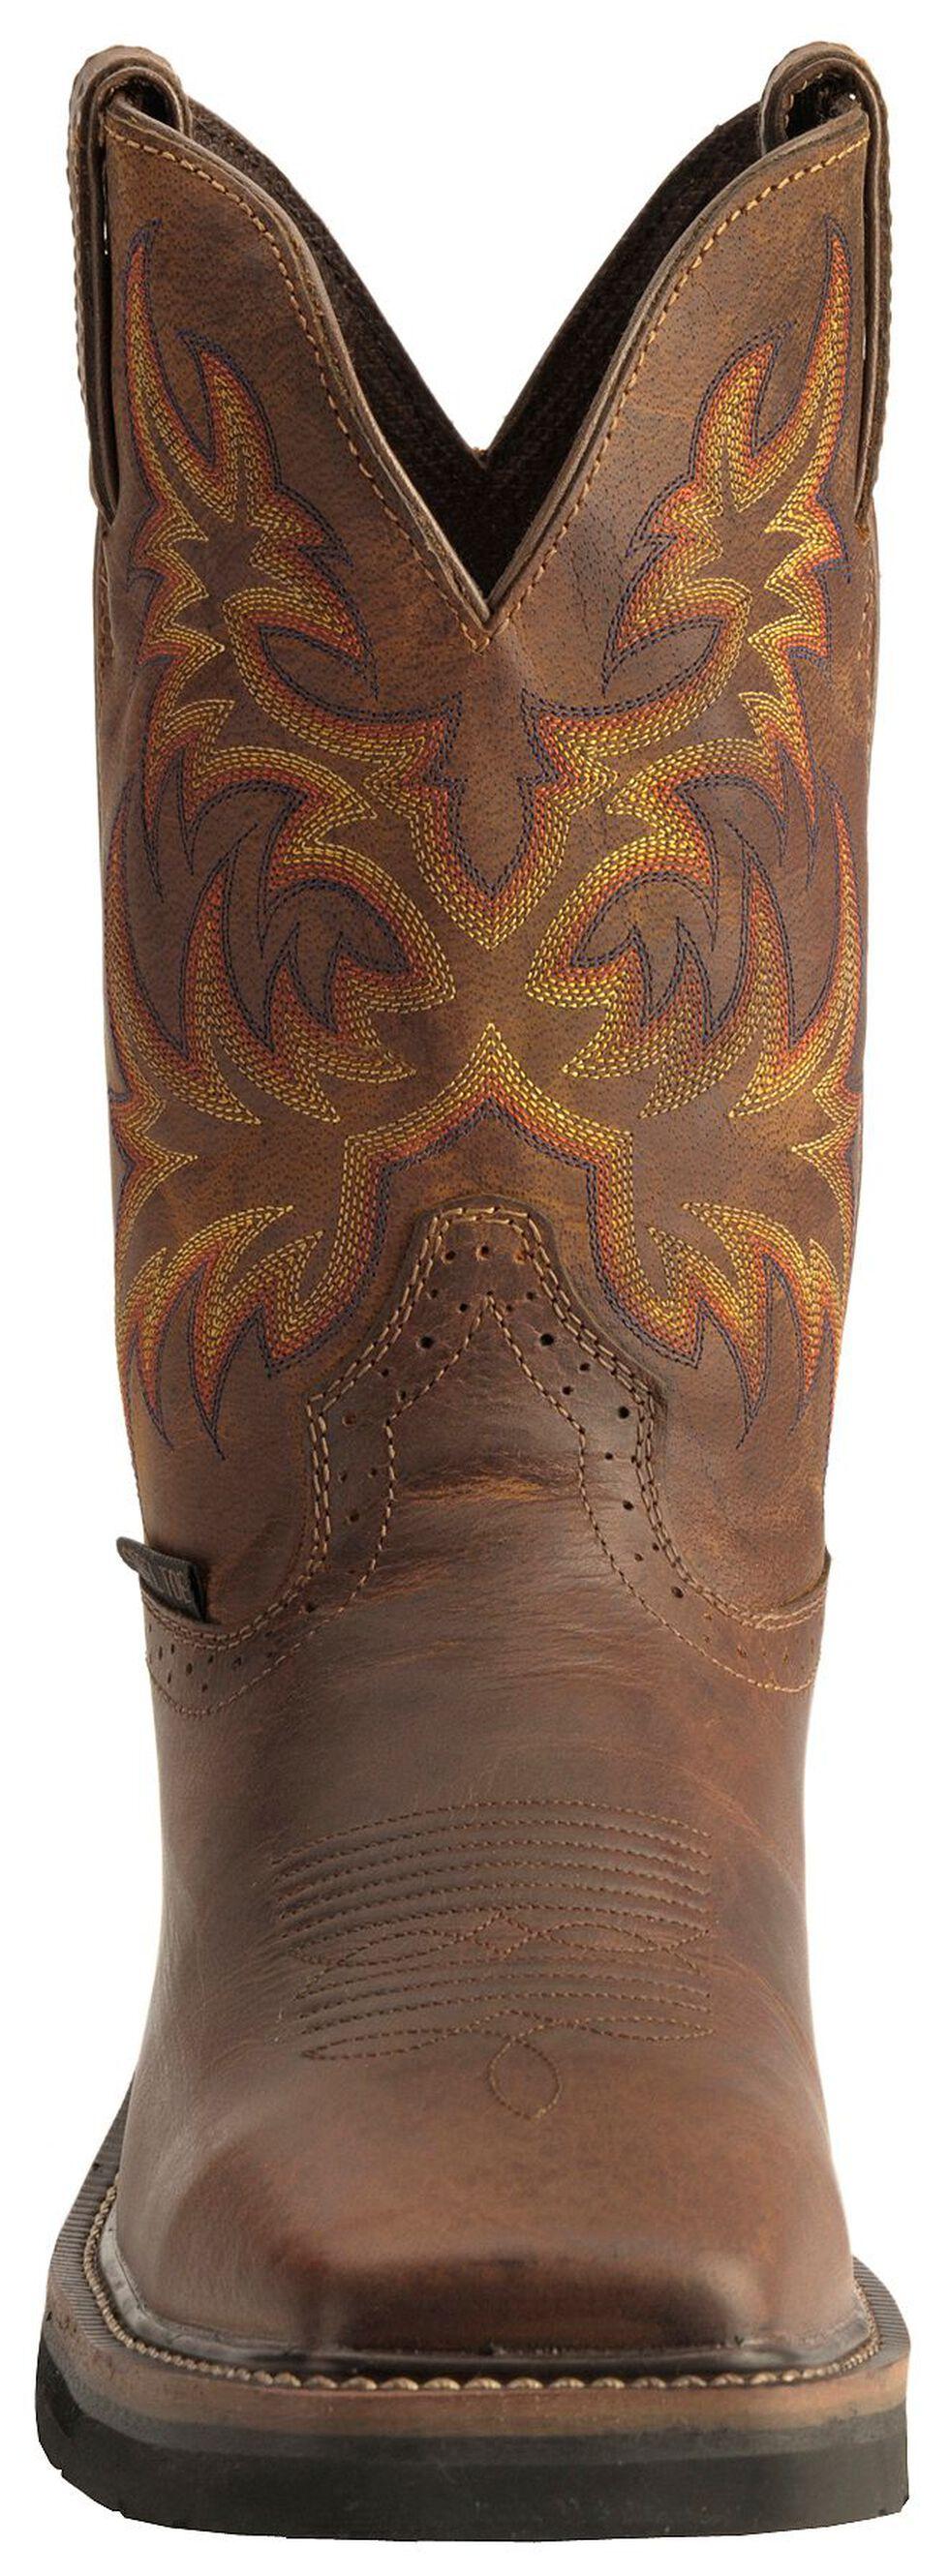 Justin Men's Stampede Driller Electrical Hazard Work Boots - Steel Toe, Tan, hi-res